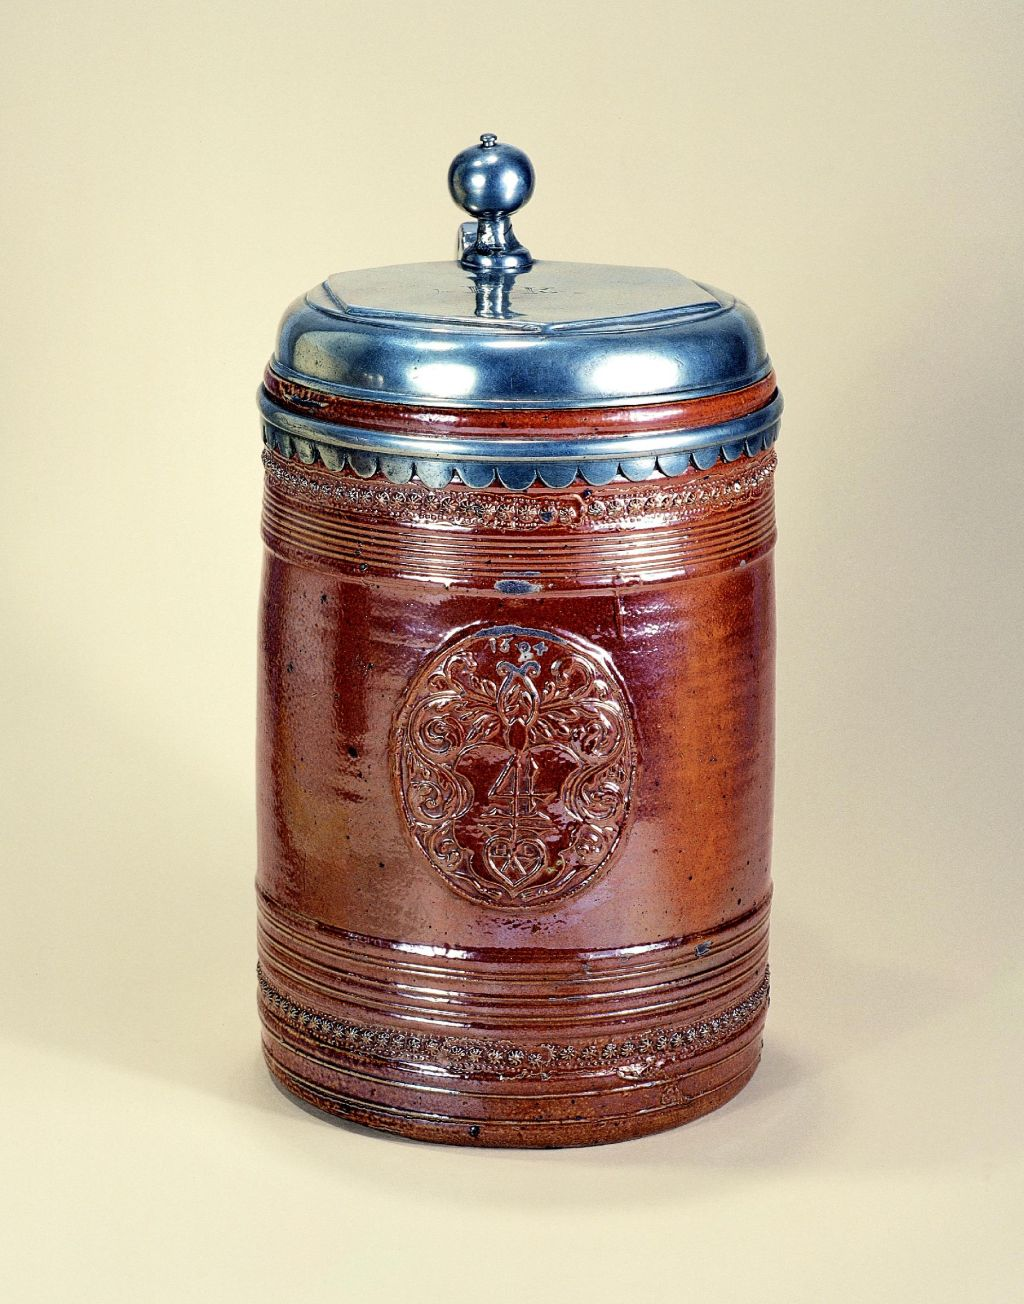 17th century saltglazed stoneware raeren-tankard-1694-datiert